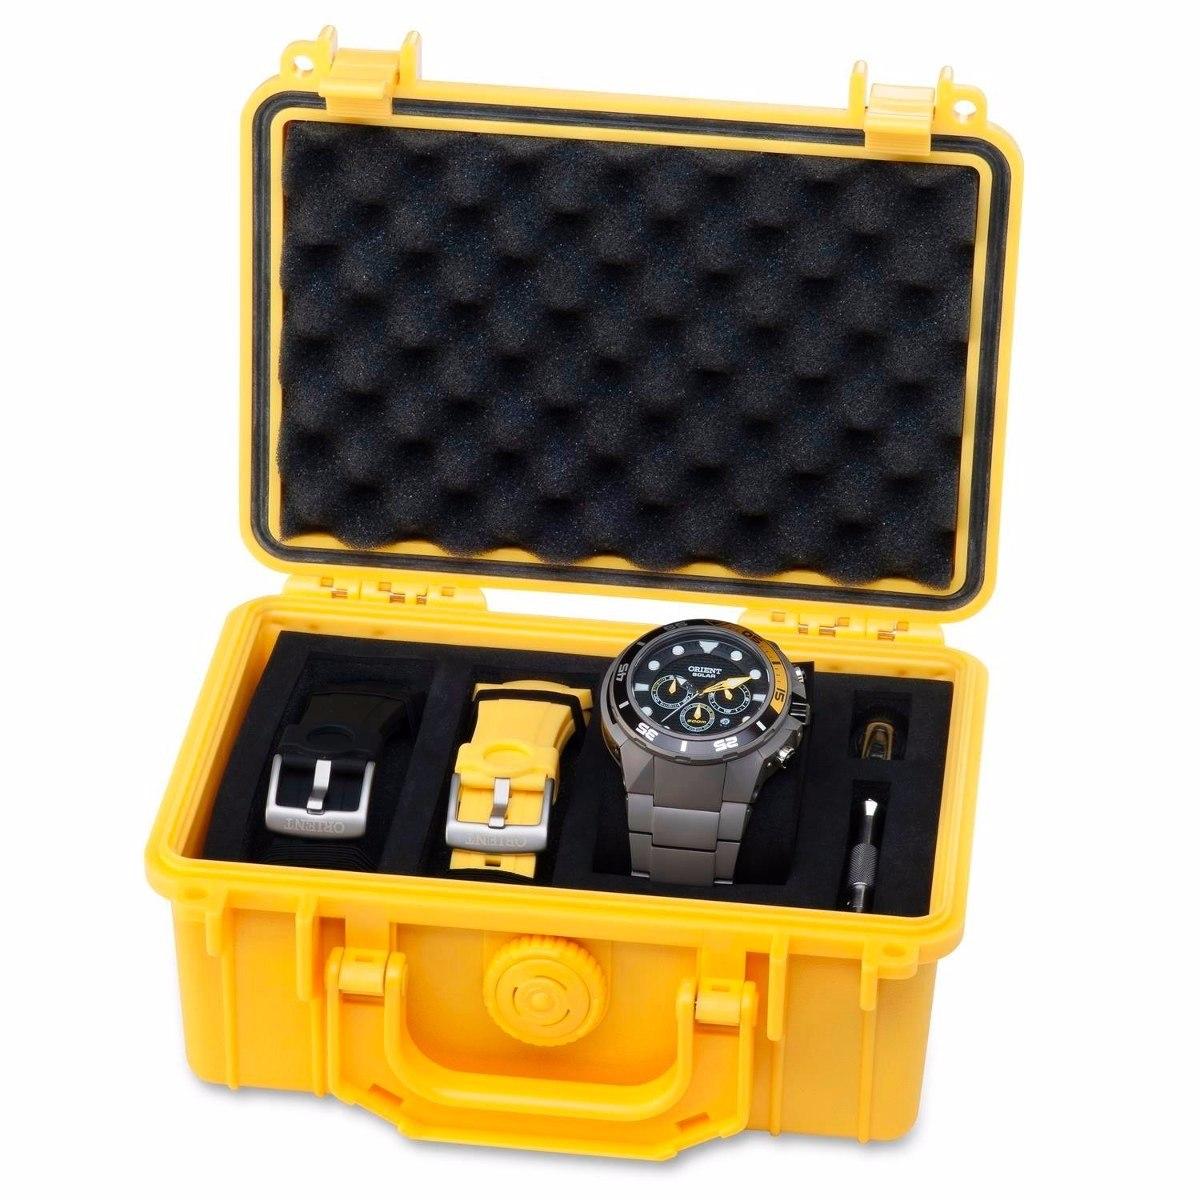 c16051b537e relógio orient seatech mergulho 500m titanium mbttc014 solar. Carregando  zoom.